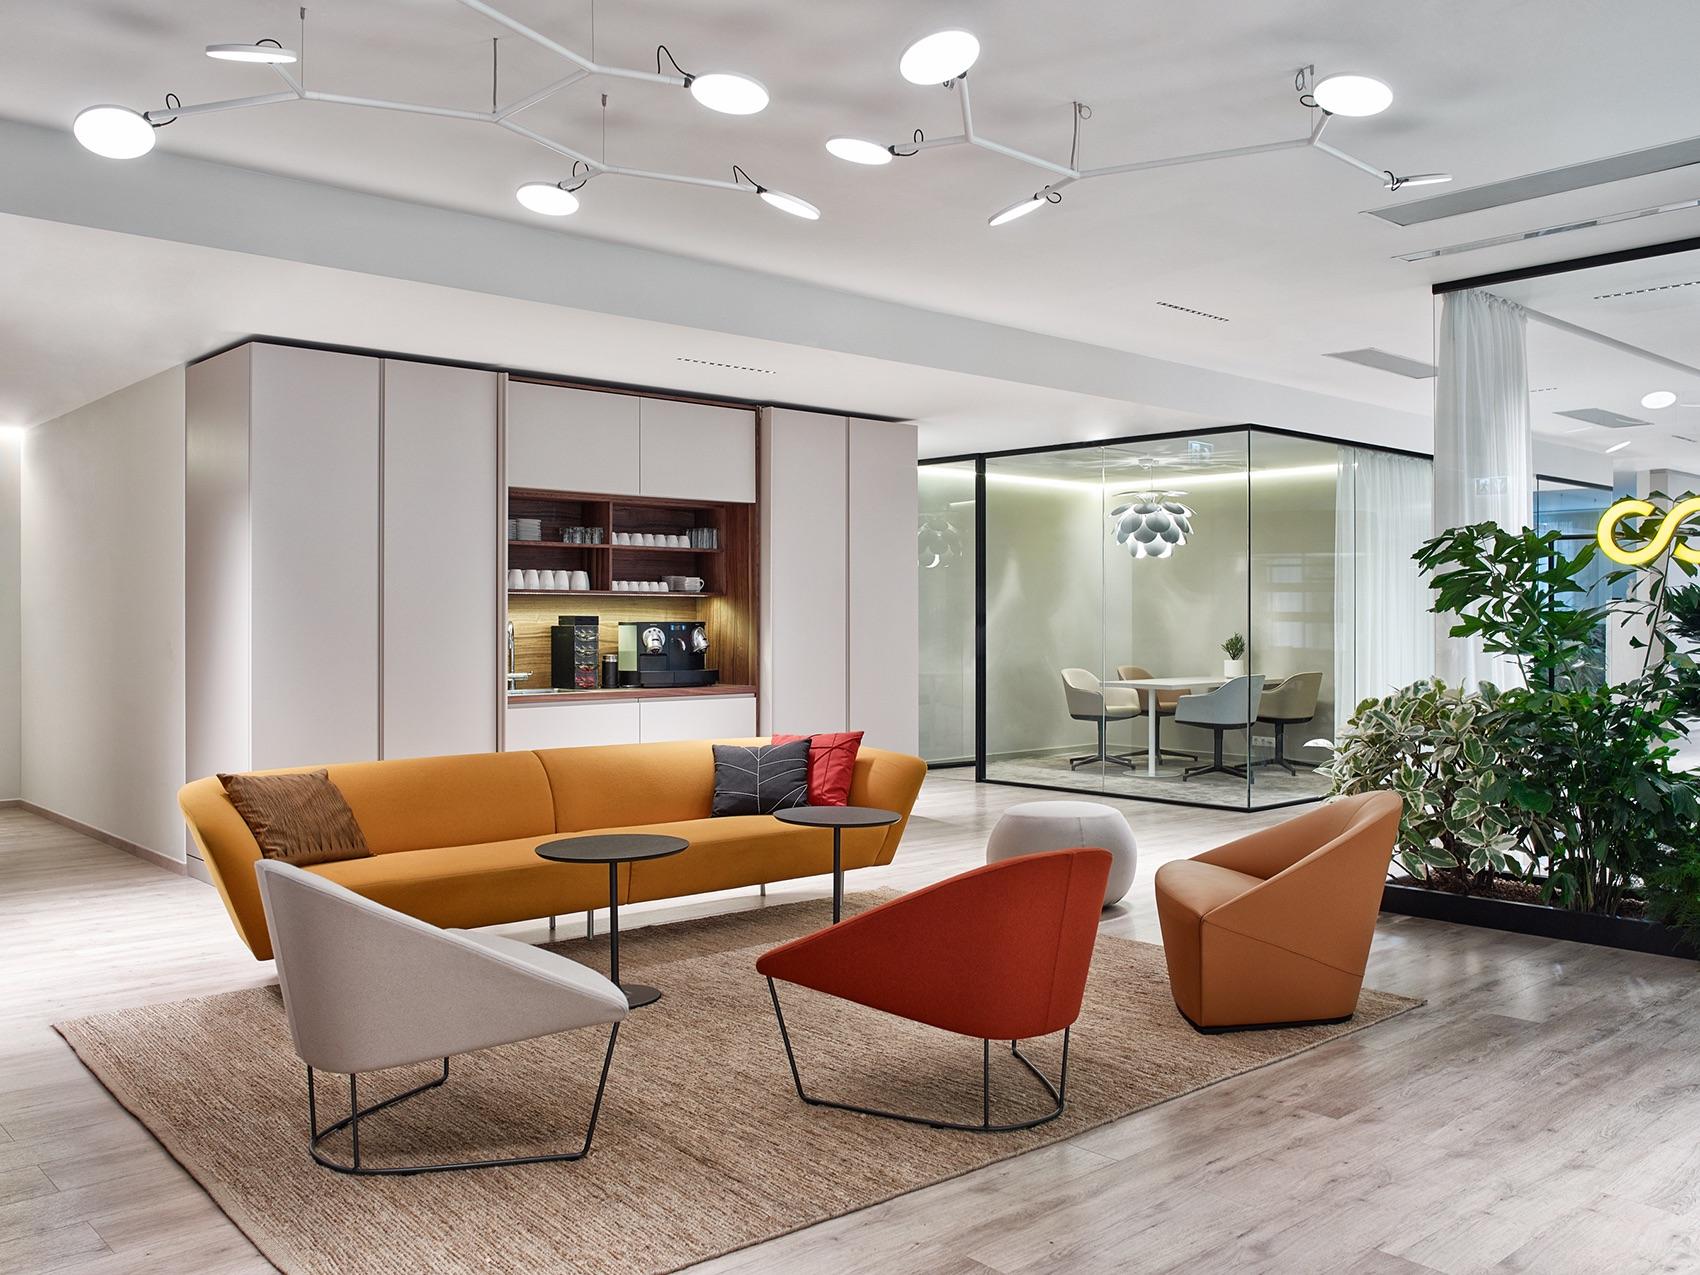 cordia-budapest-office-5